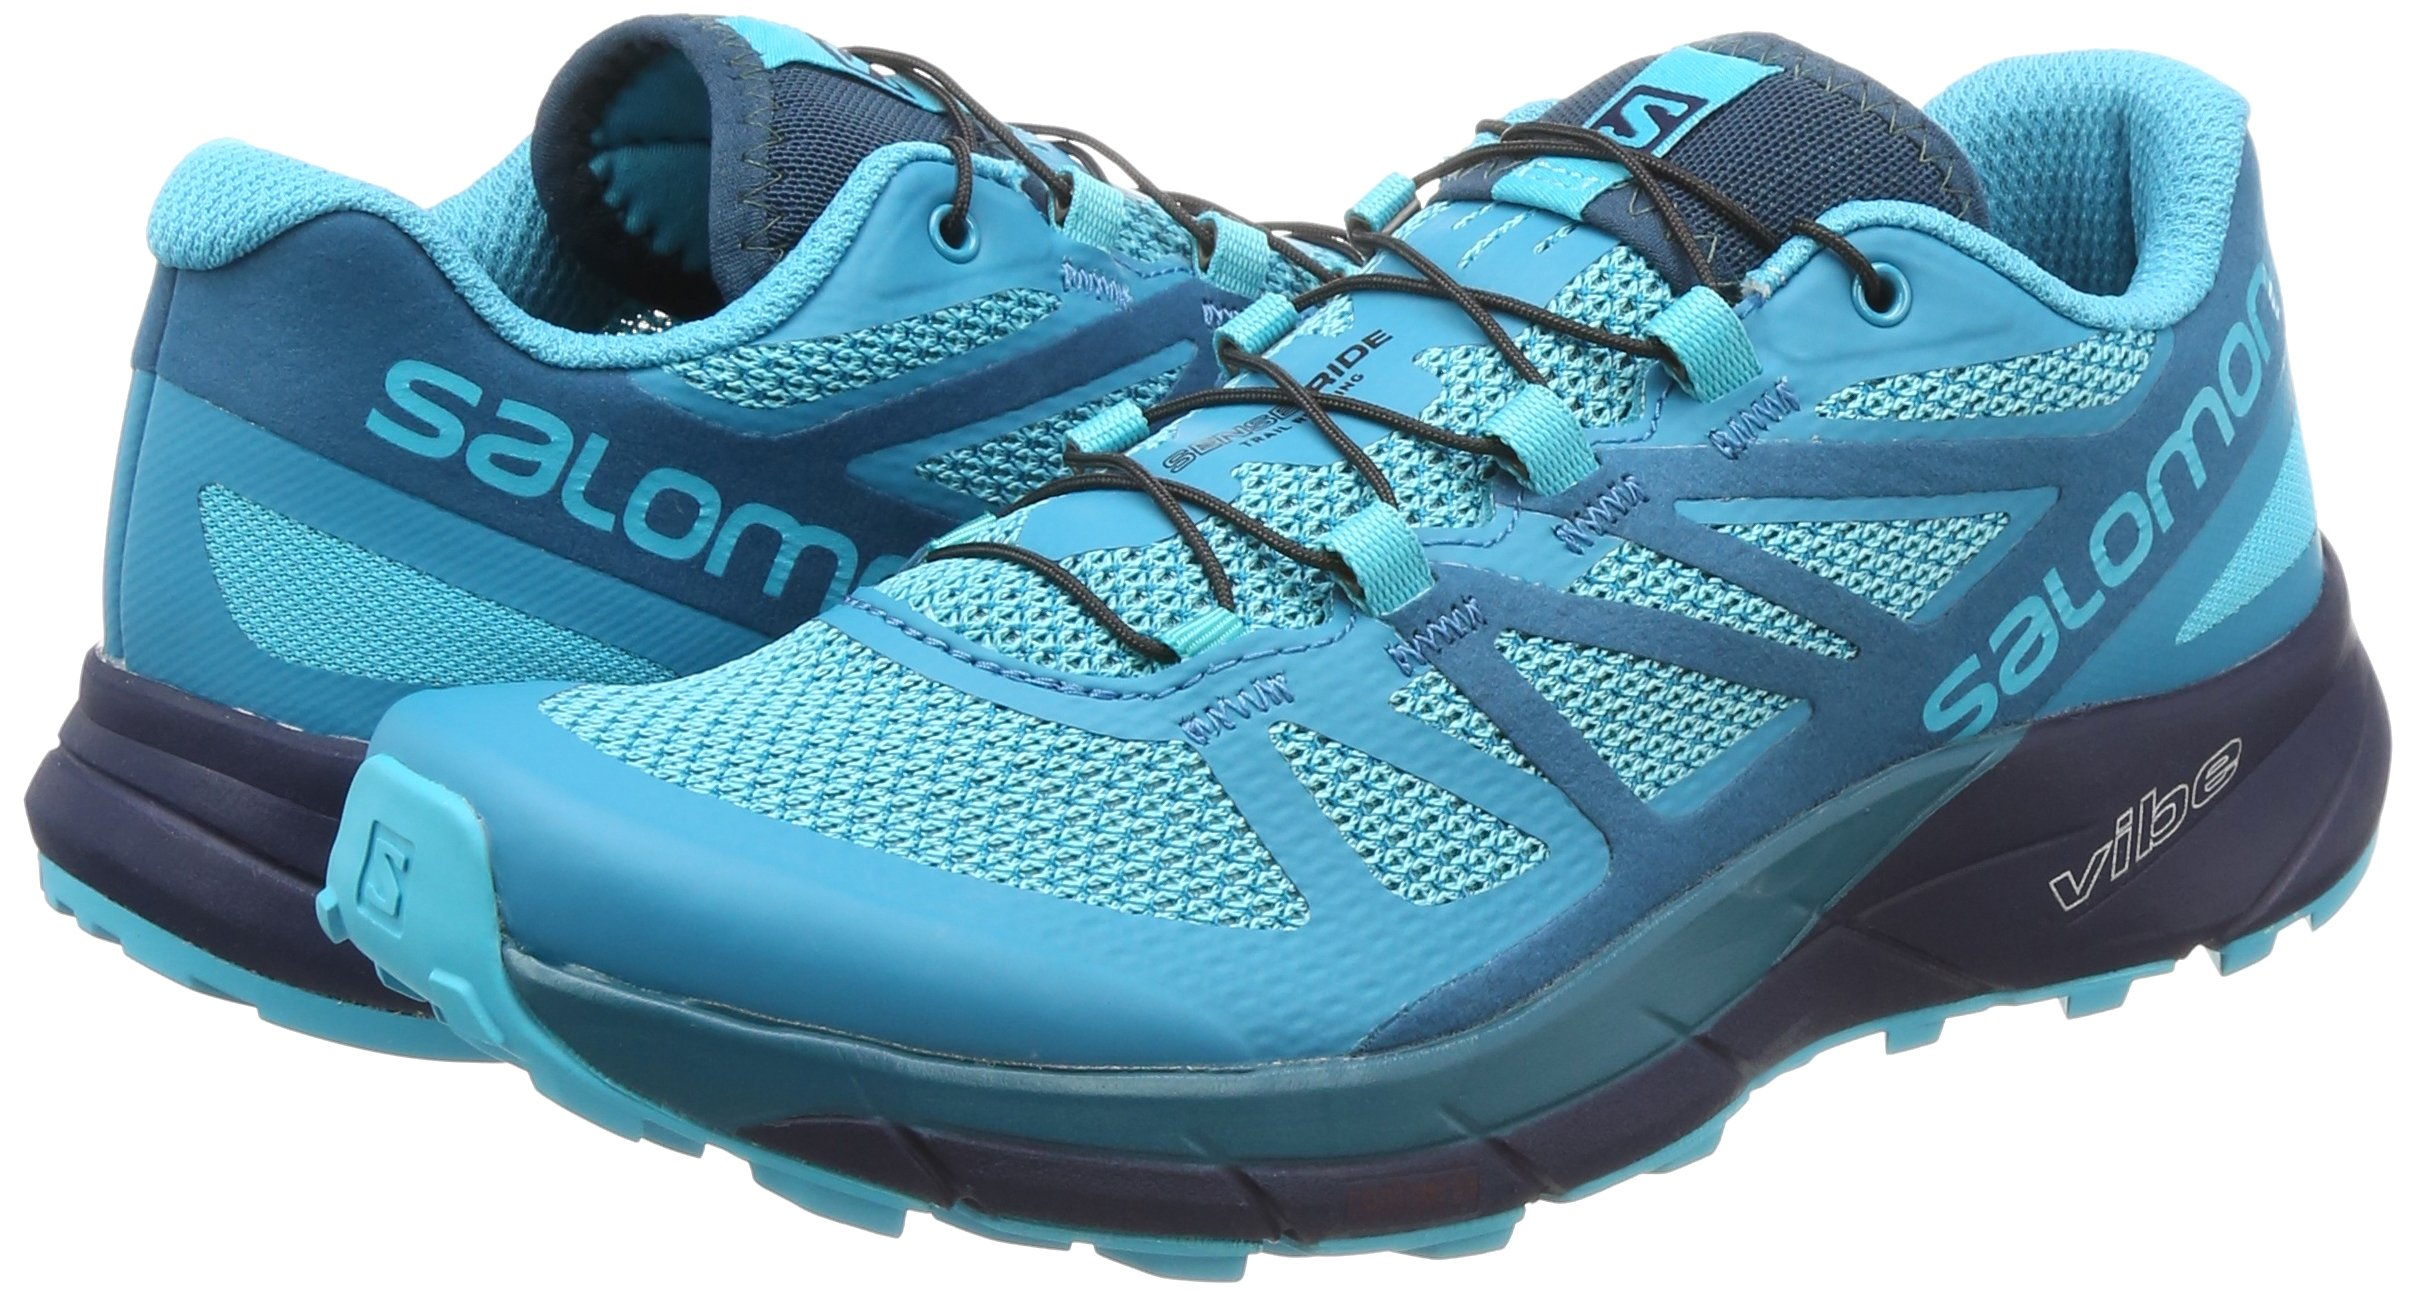 Salomon Sense Ride Running Shoe - Women's Blue Bird/Deep Lagoon/Navy Blazer 7 by Salomon (Image #5)